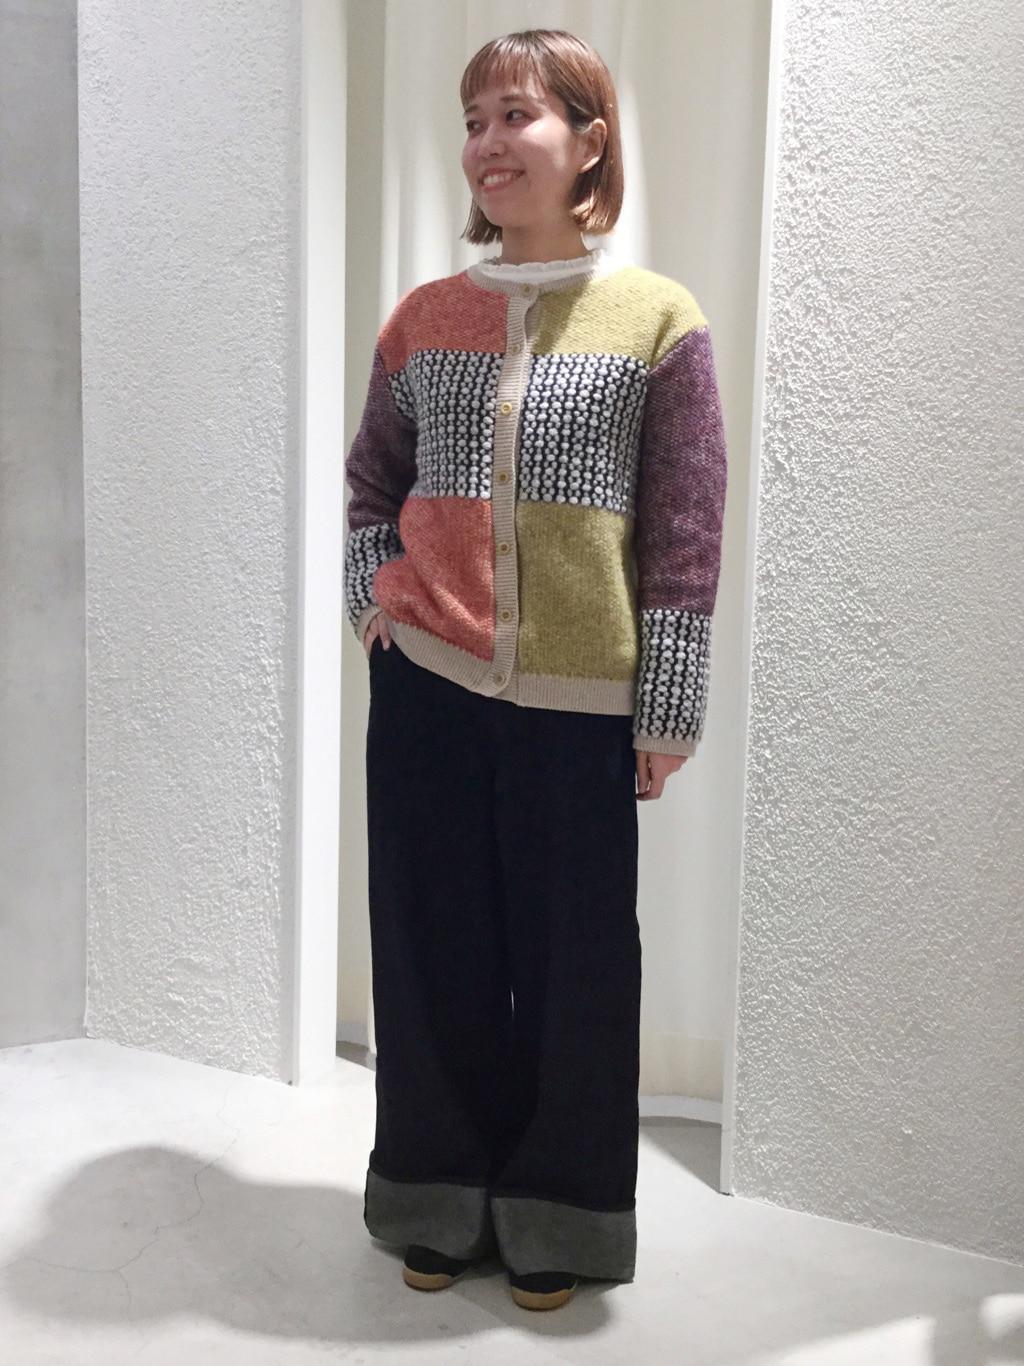 chambre de charme キラリナ京王吉祥寺 身長:157cm 2020.11.27